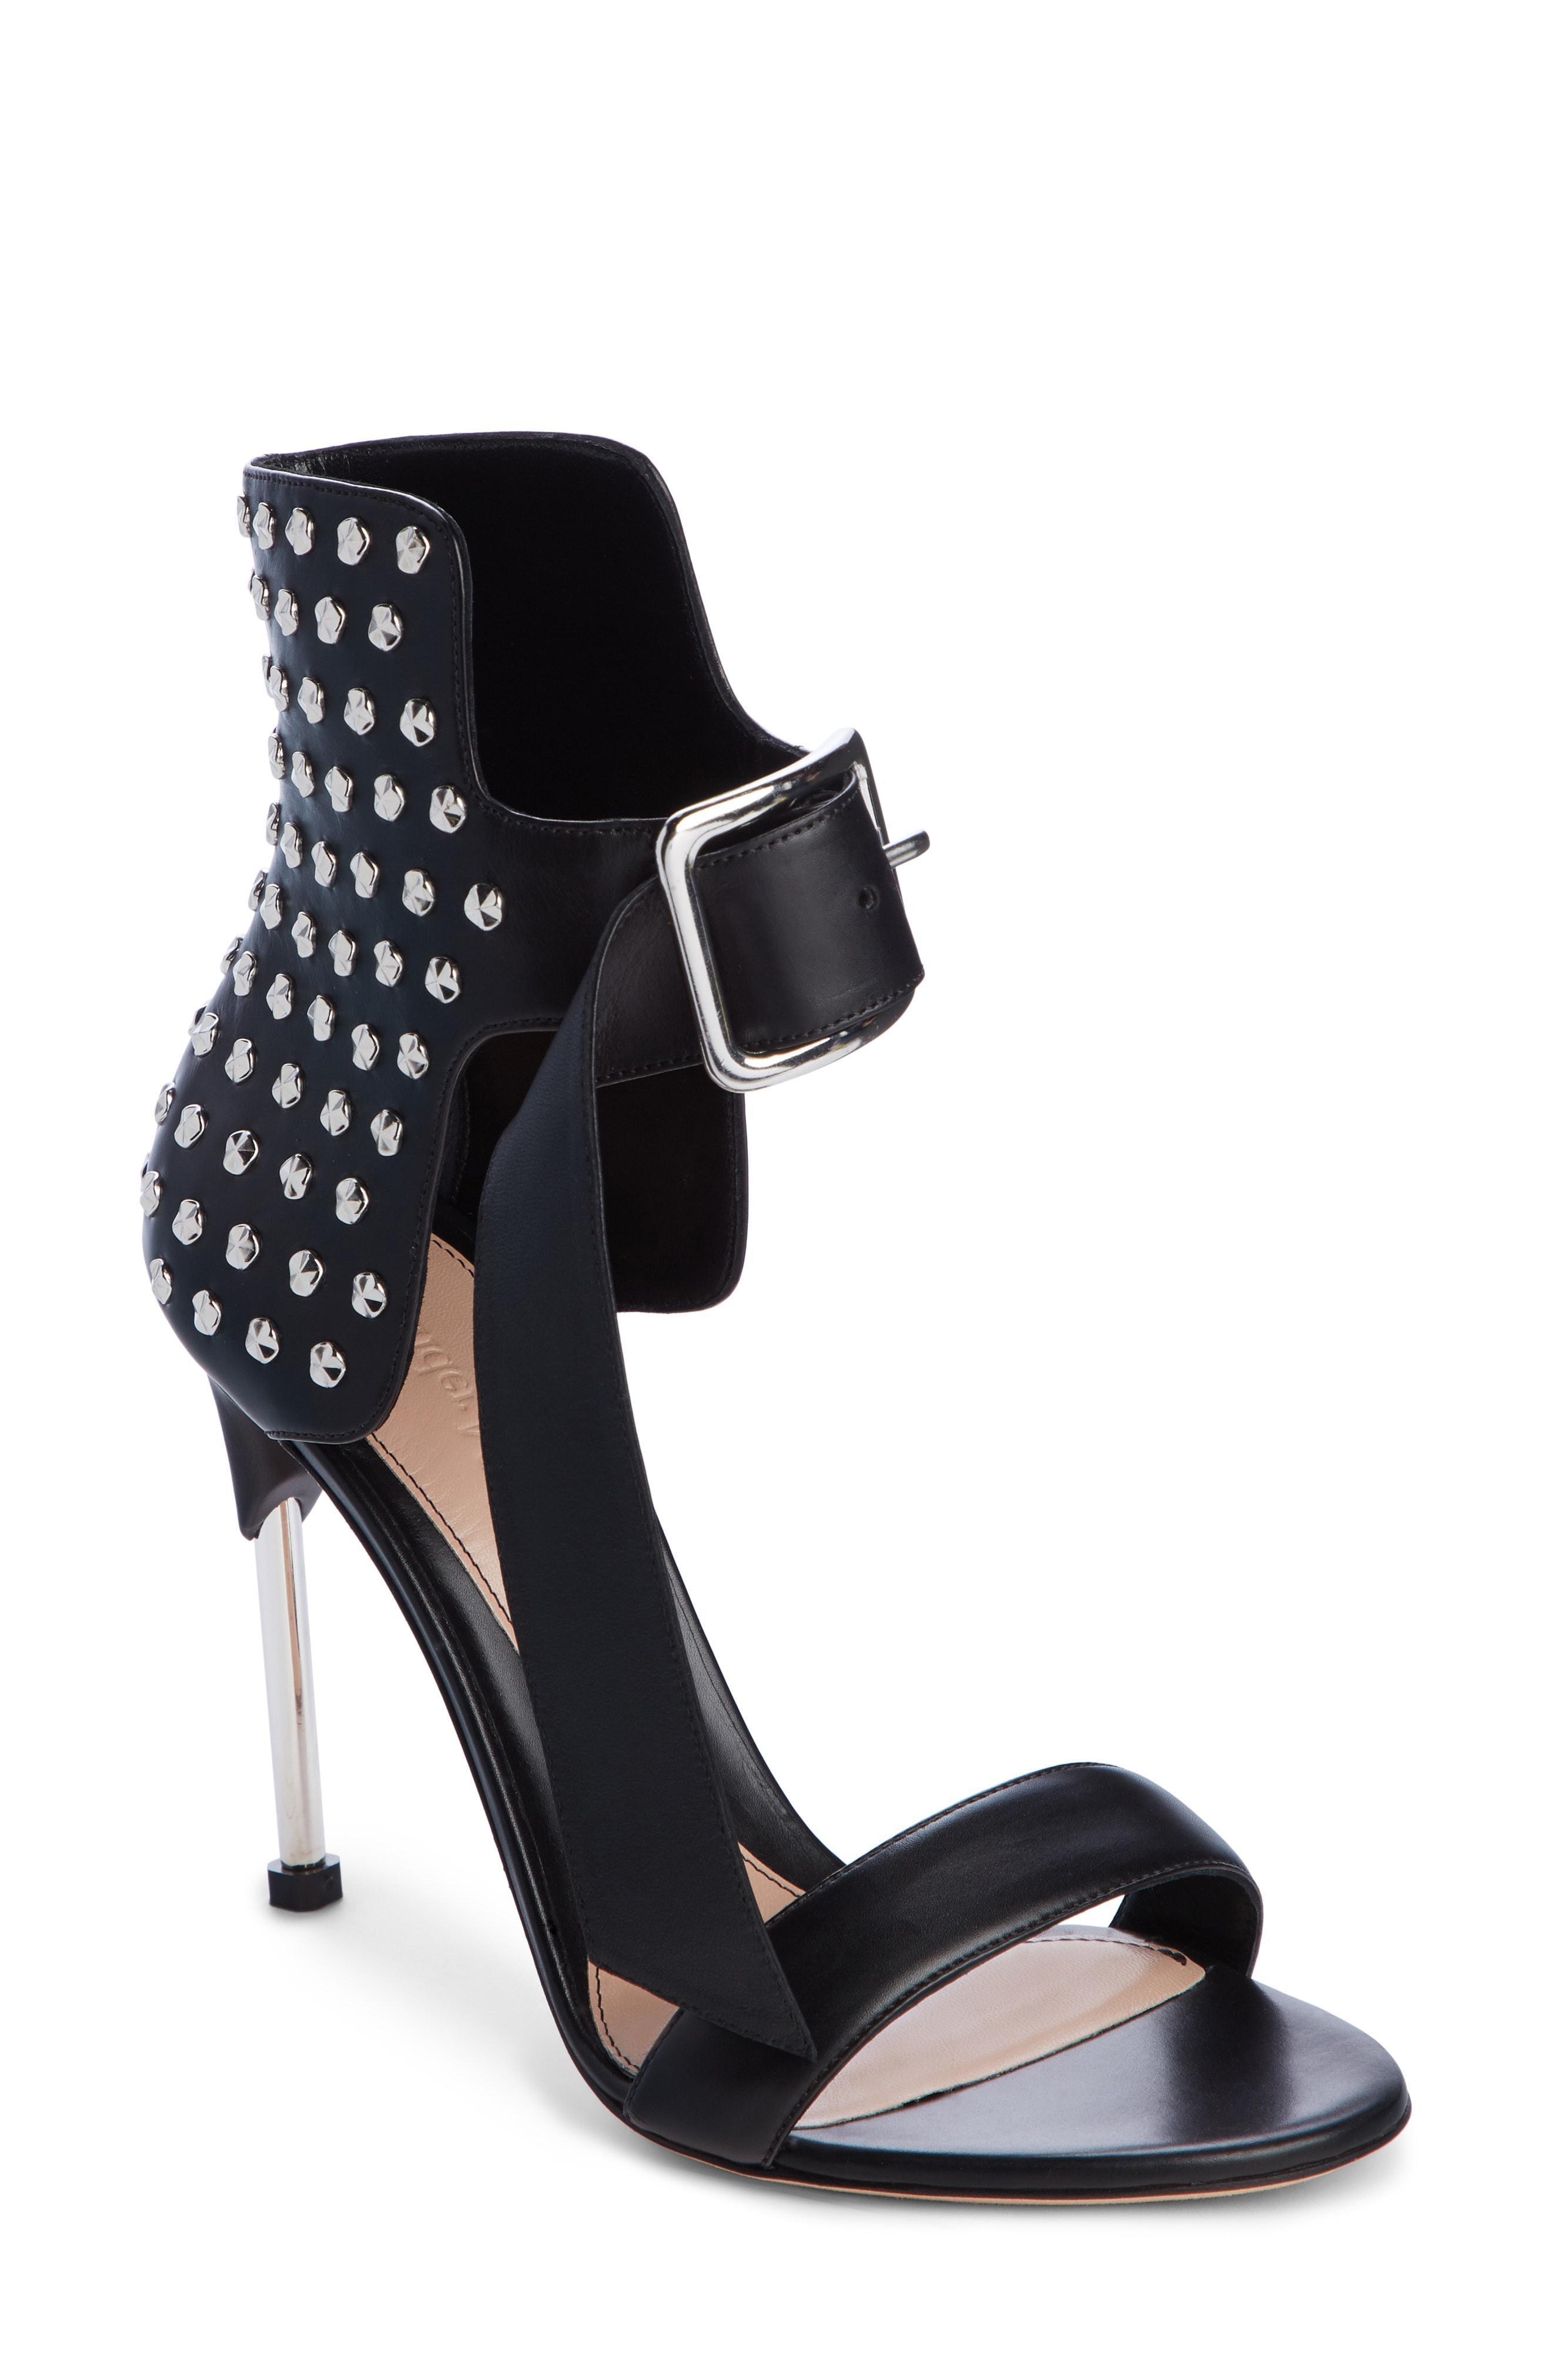 c4c697346553 Lyst - Alexander McQueen Studded Ankle Strap Sandal in Black